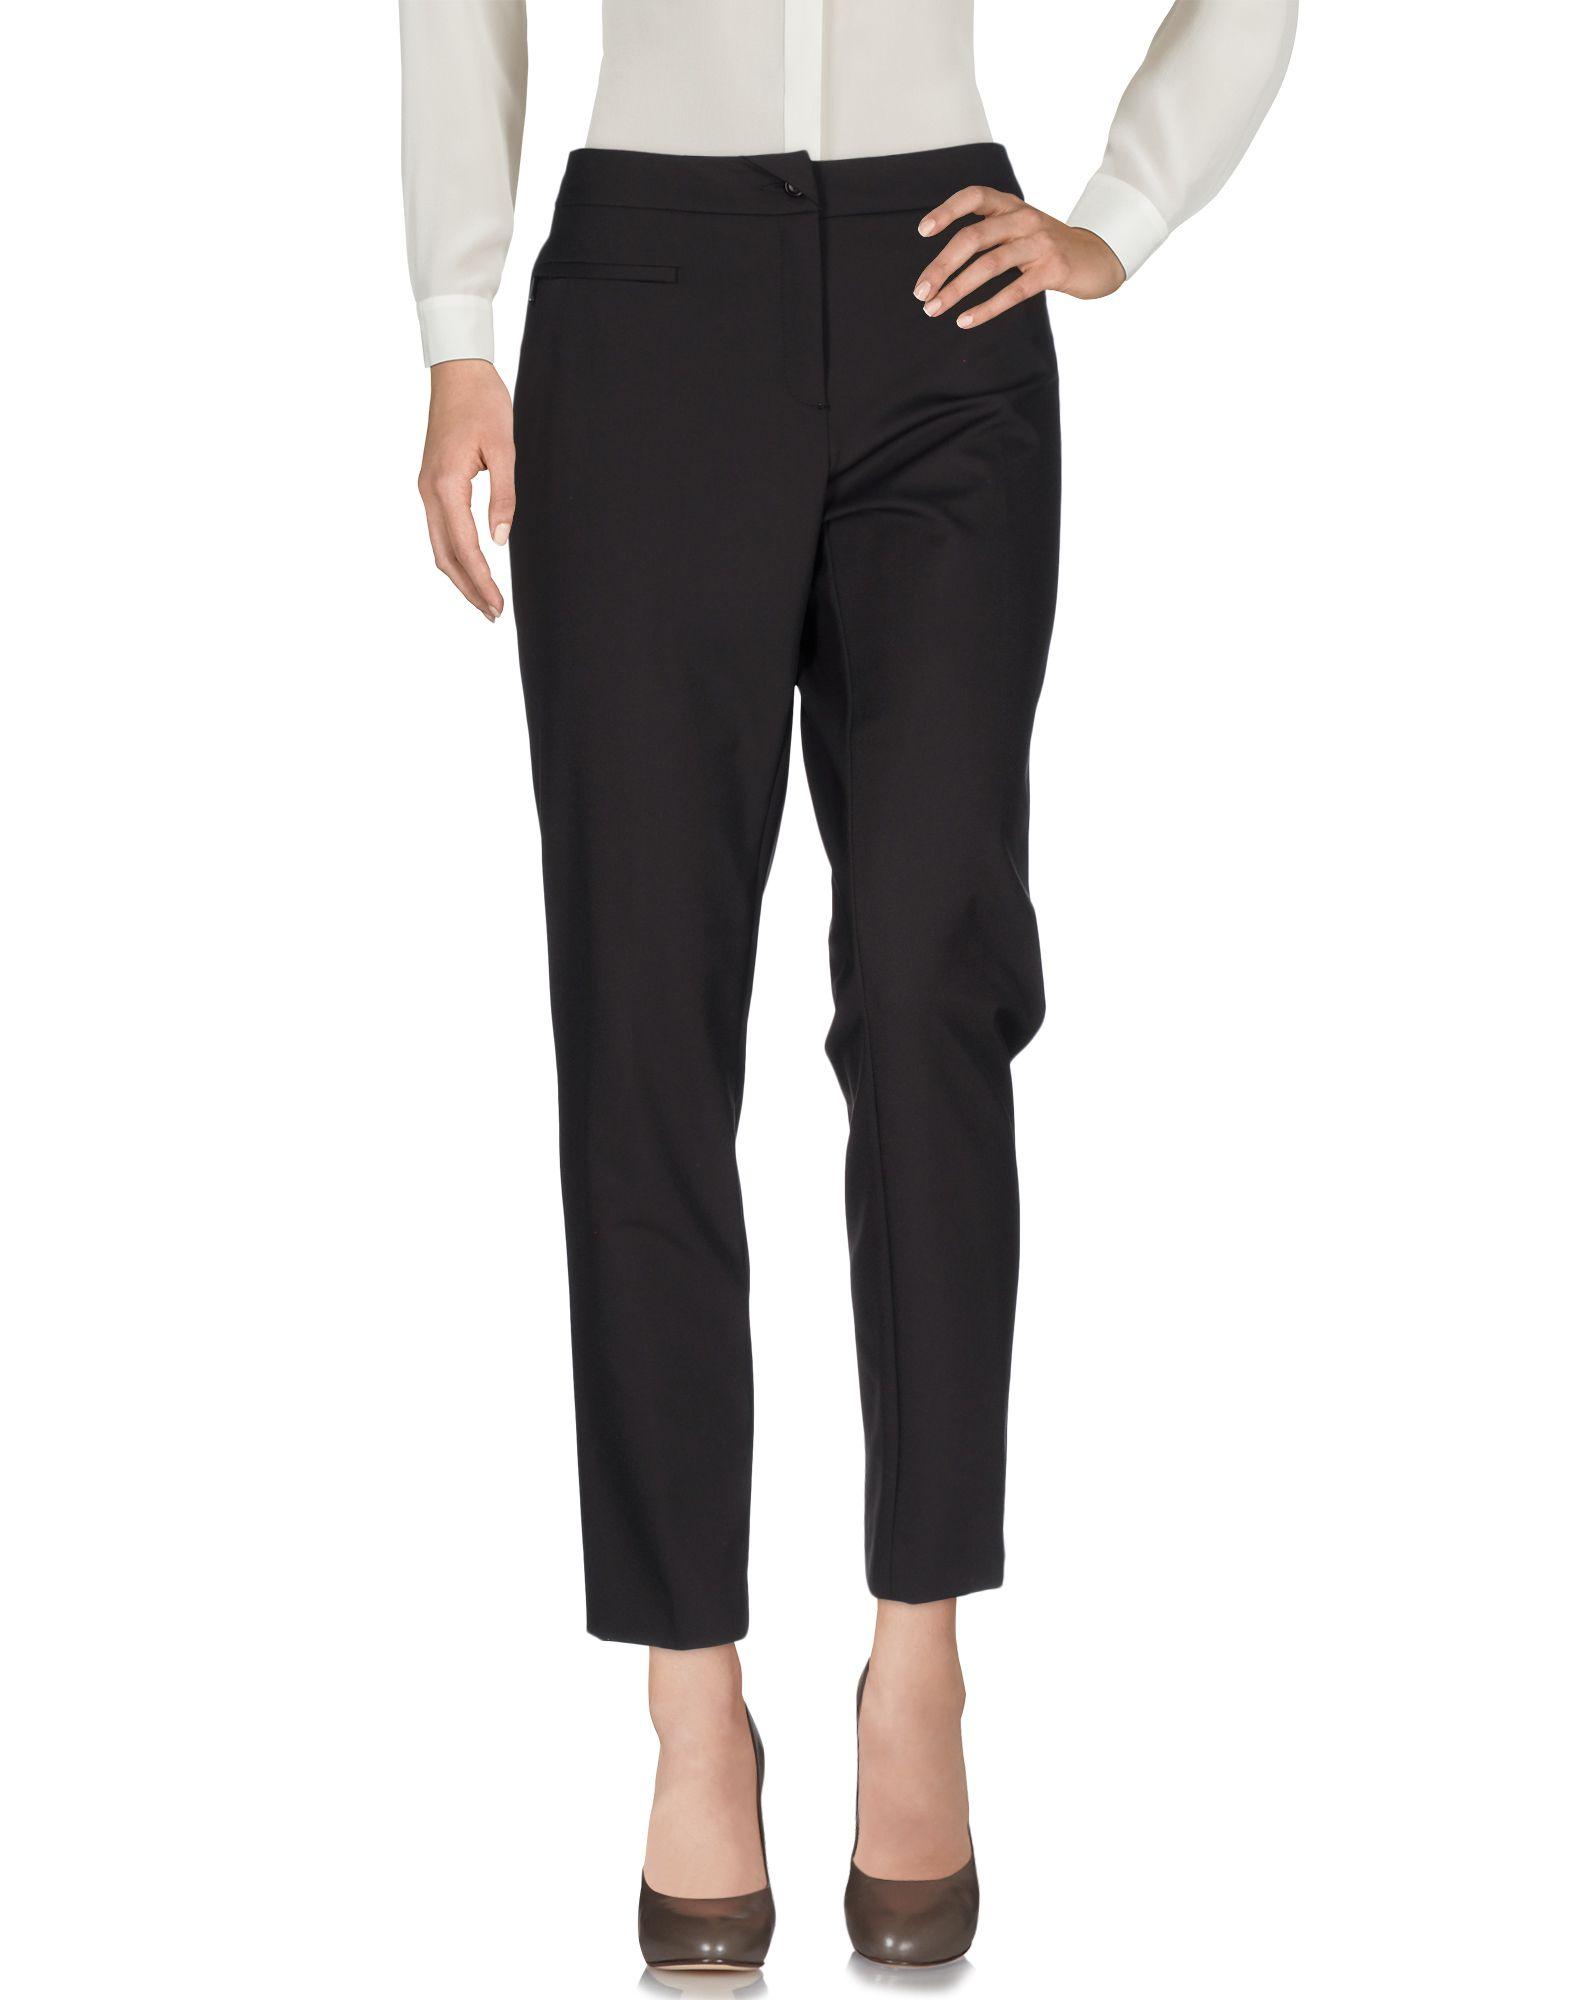 Pantalone Seventy Sergio Tegon donna - 13021216HA 13021216HA  Fitness-Händler